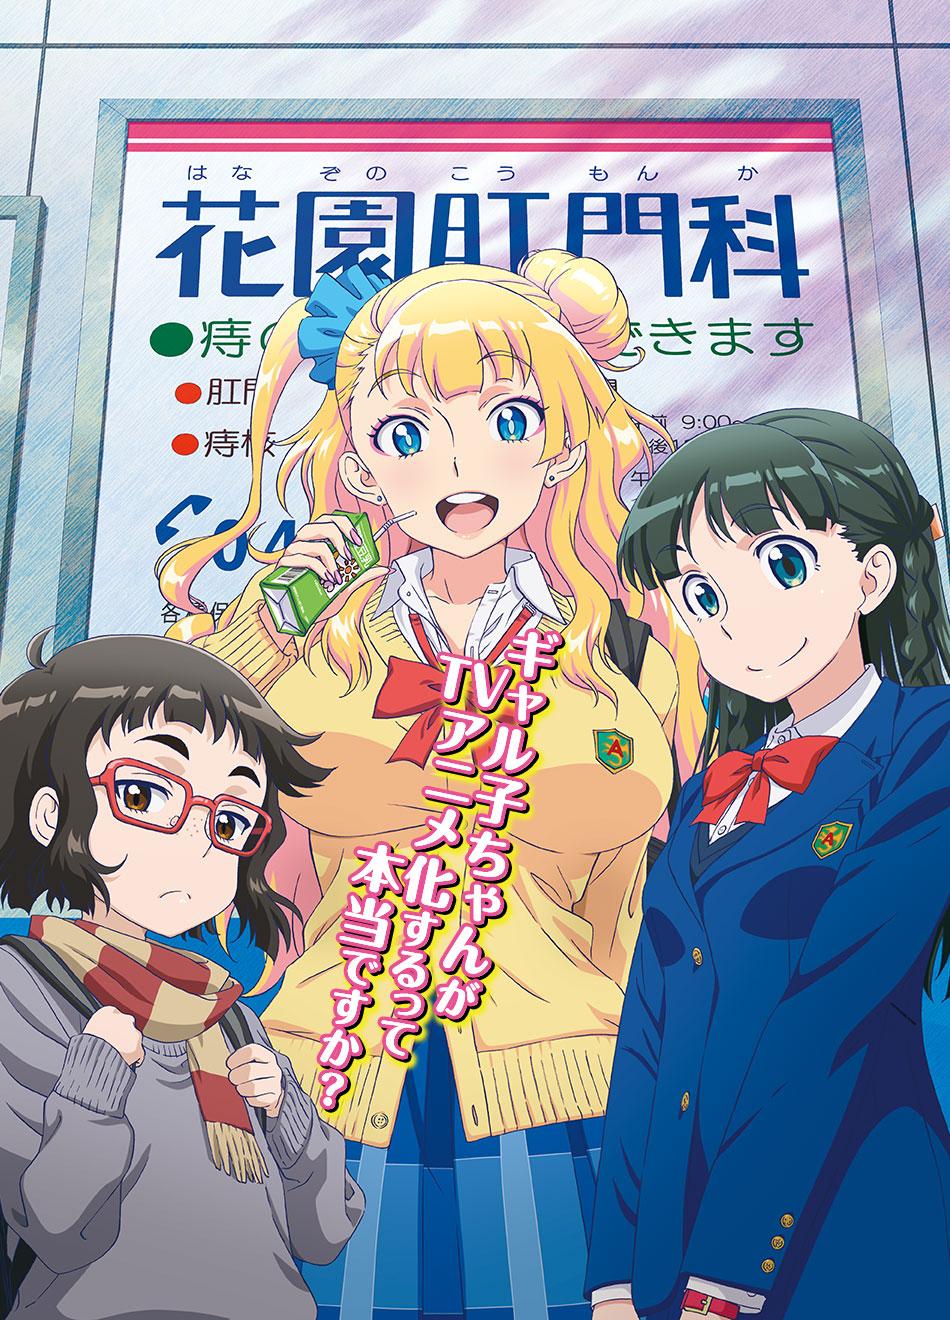 Oshiete! Galko-chan Anime visual